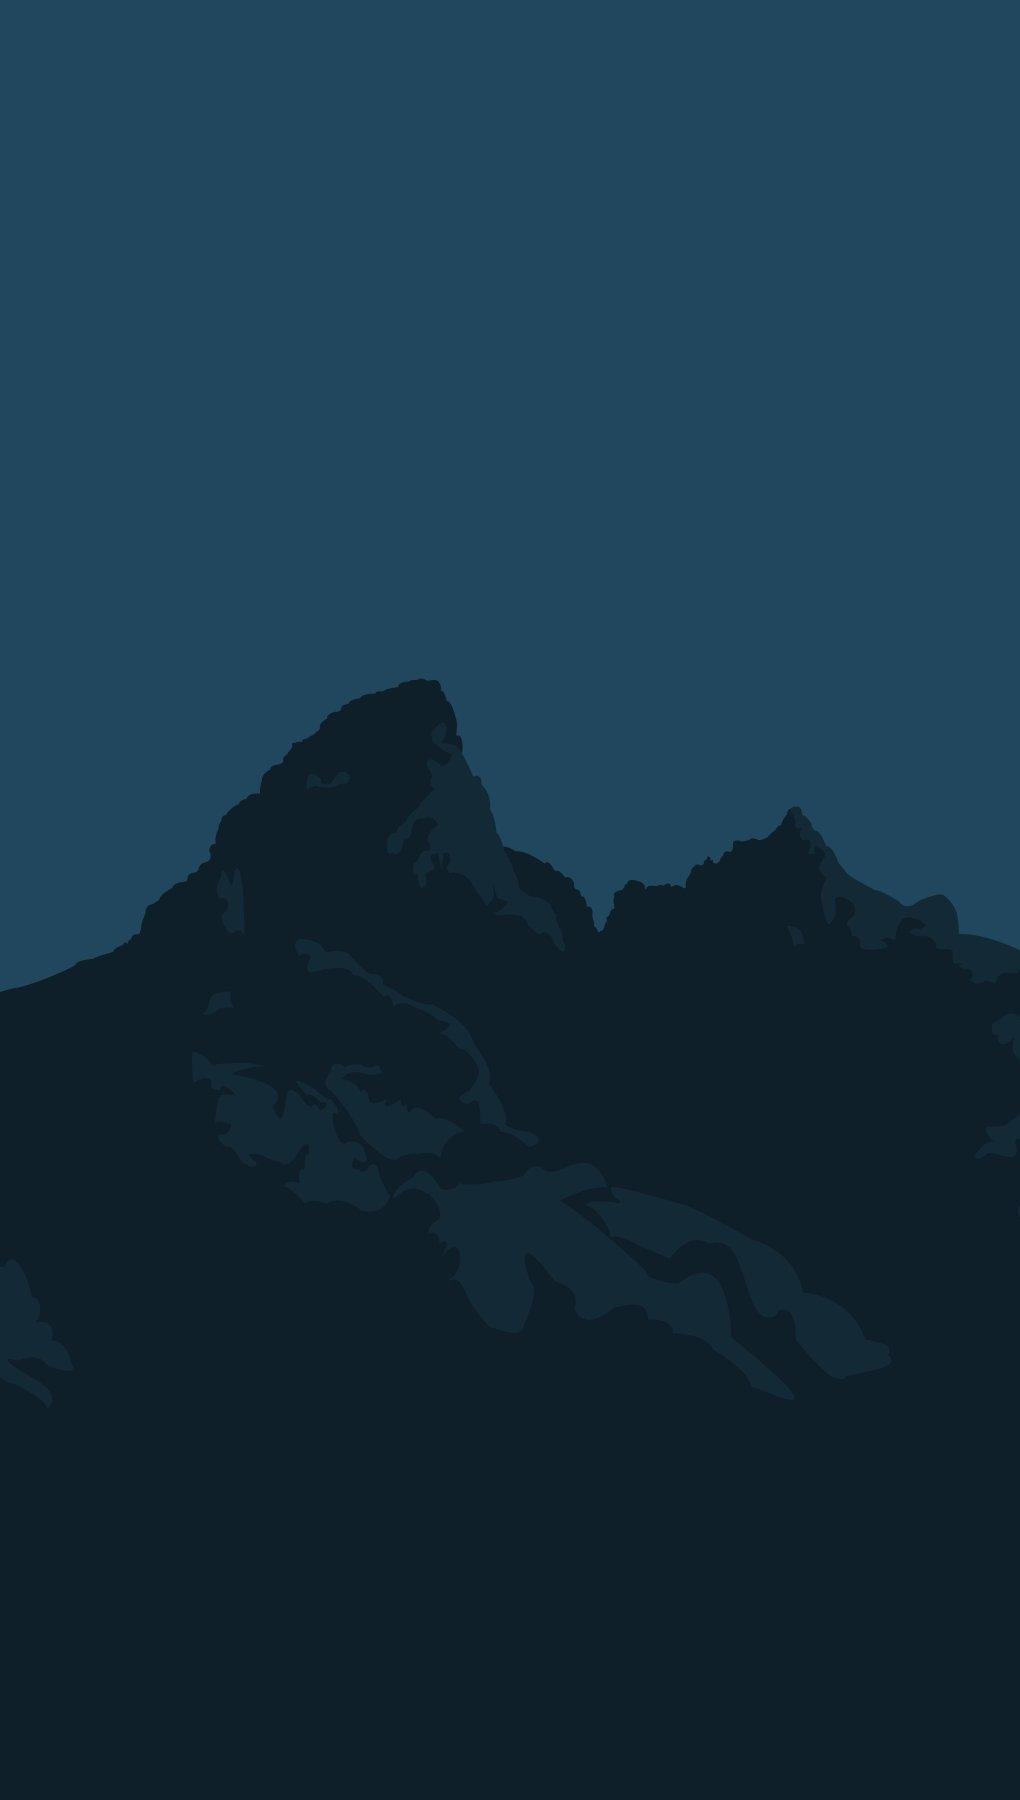 Fondos de pantalla Montañas Minimalista Flat Vertical